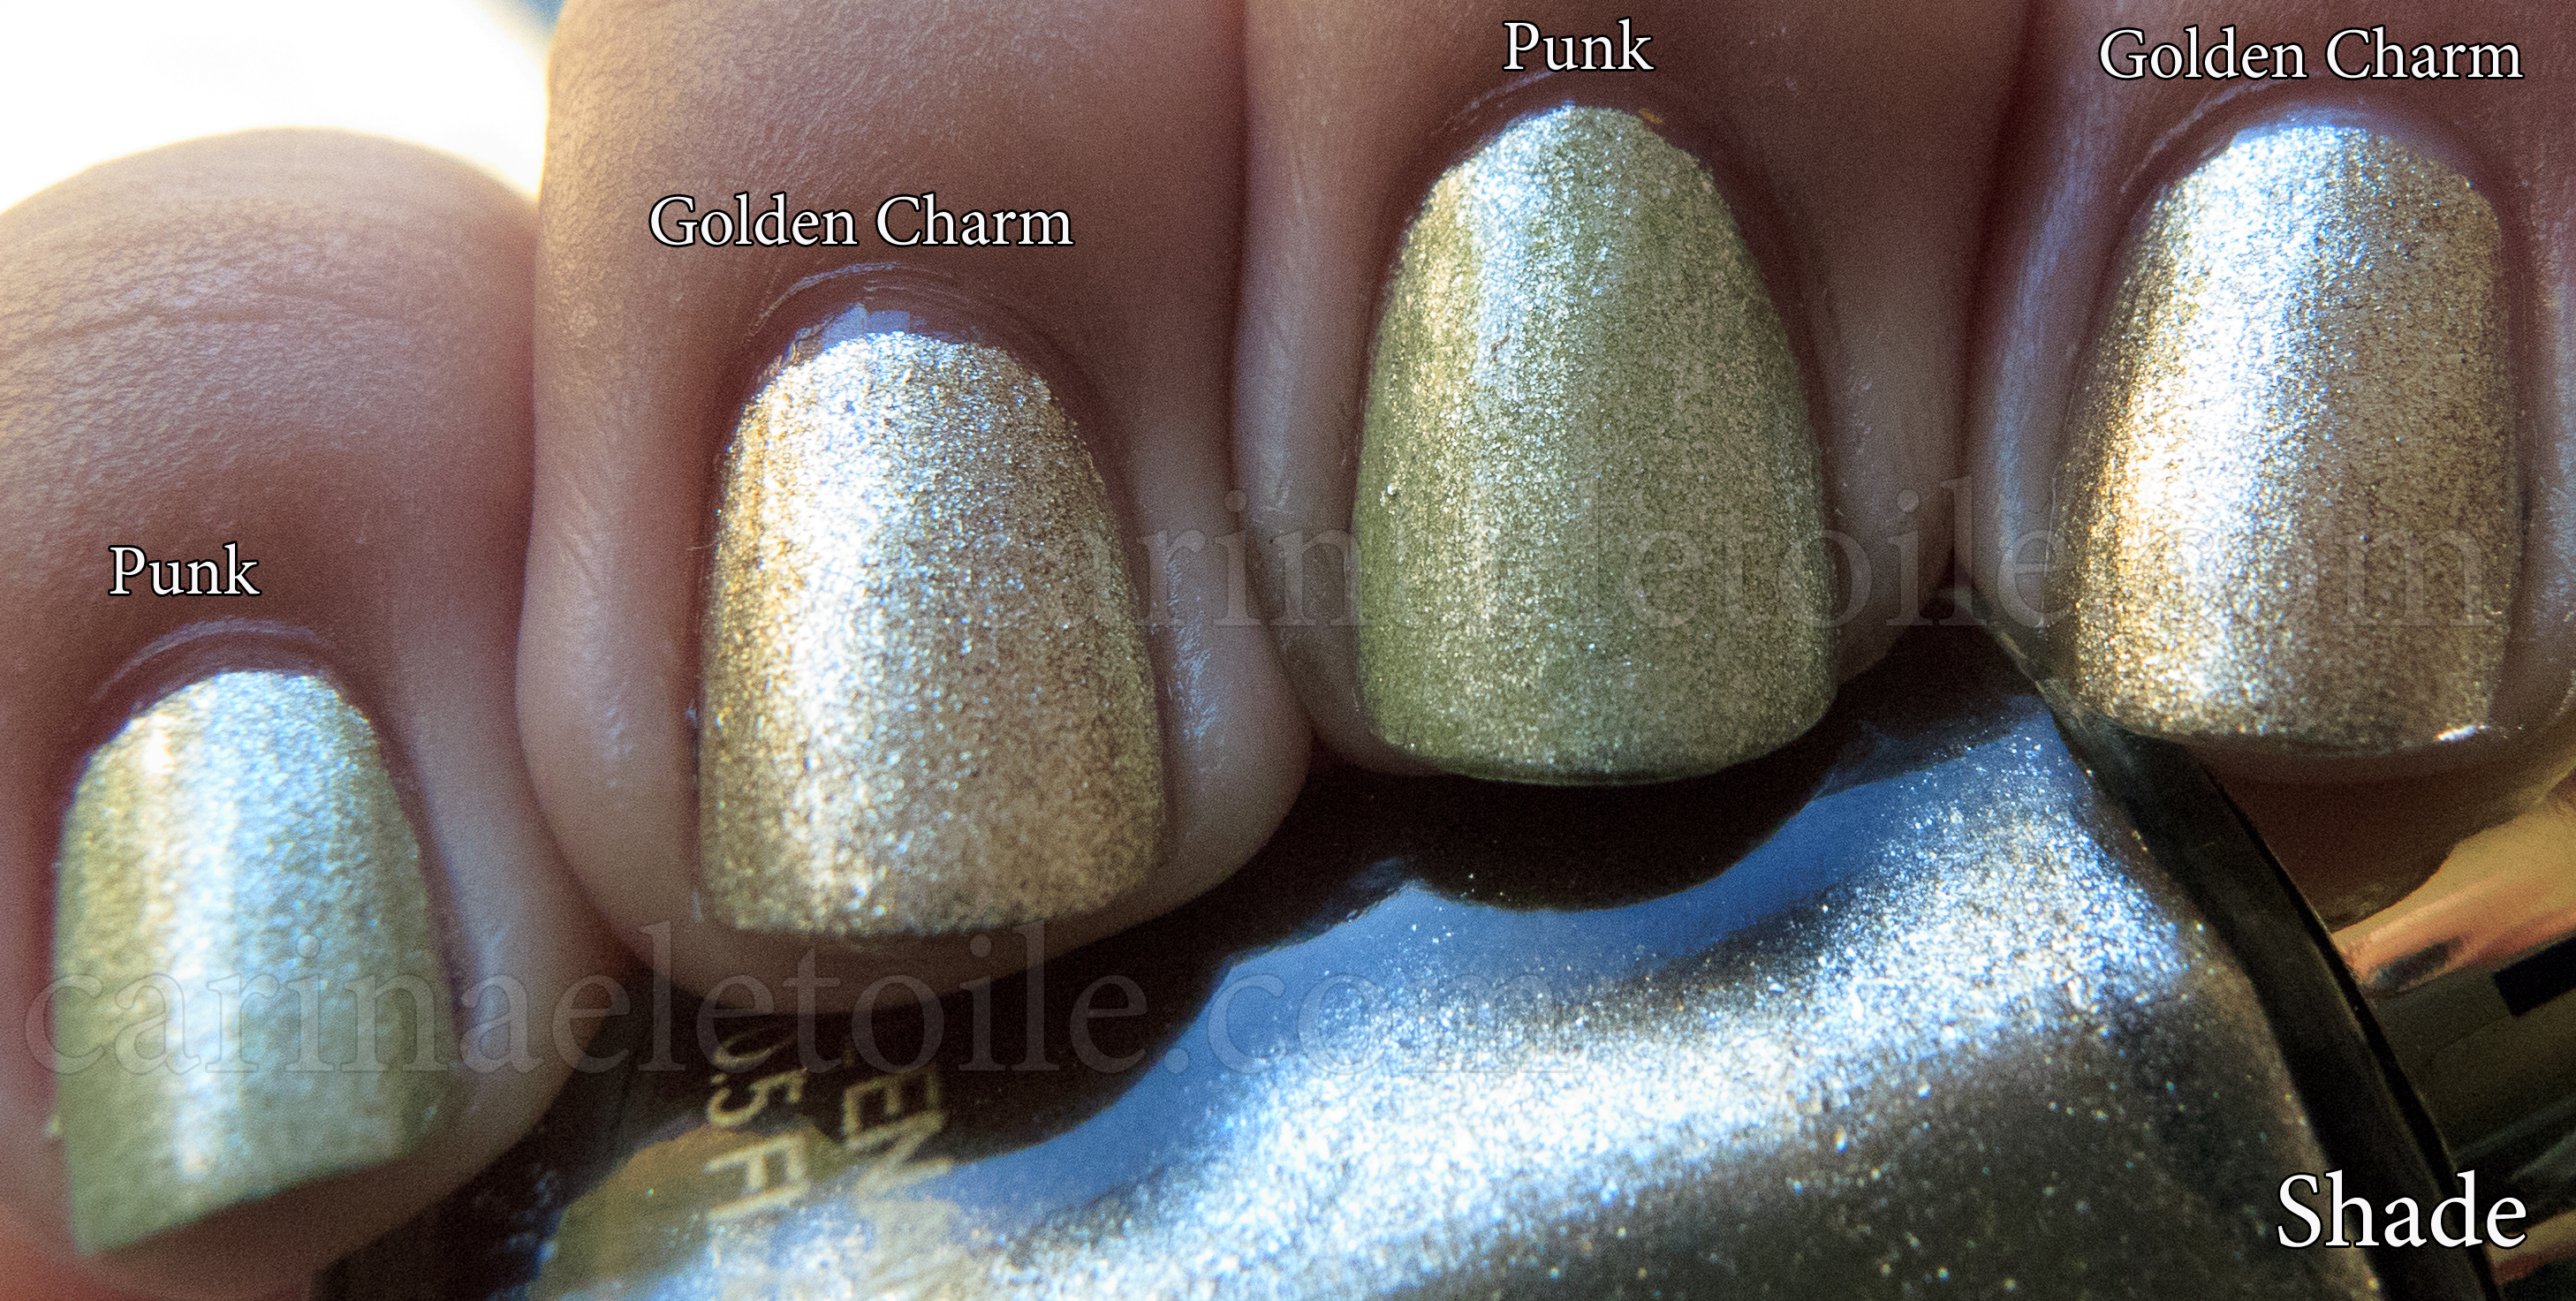 Revlon Golden Charm Punk